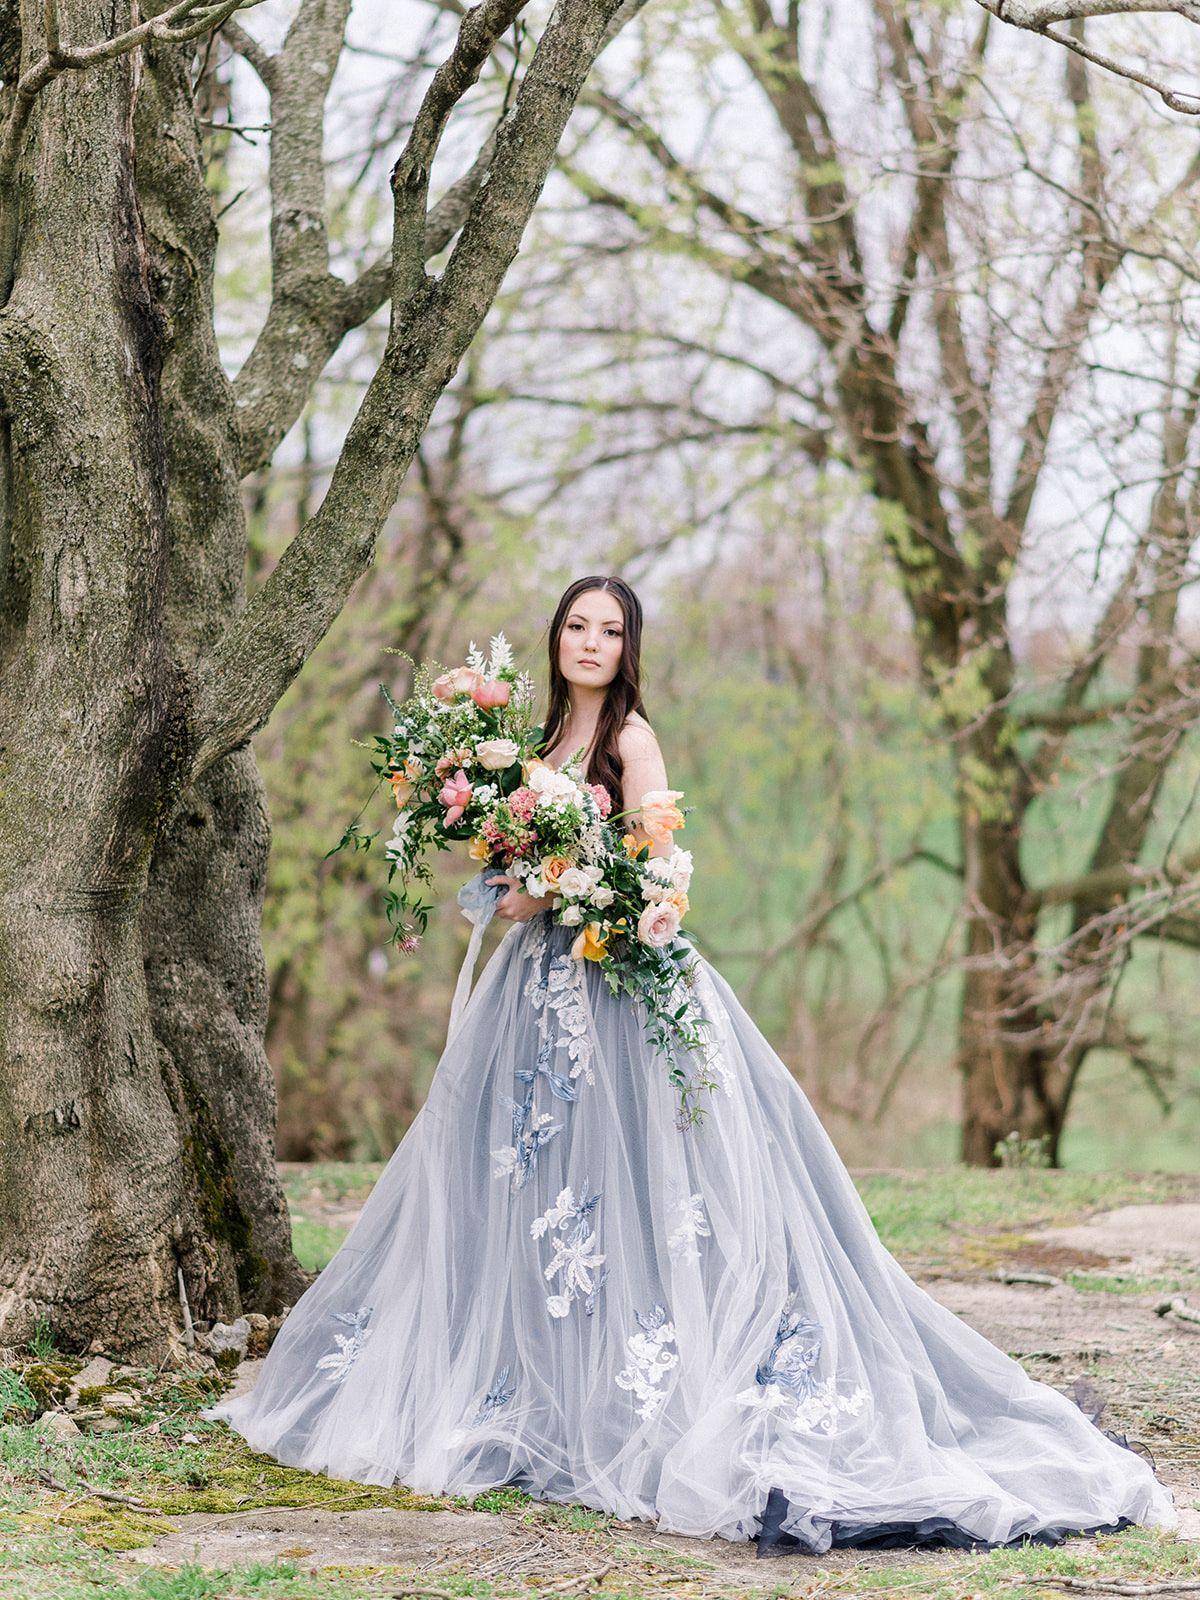 This Blue Ballgown Wedding Dress Is Giving Us Major Princess Vibes Wedding Dresses Whimsical Fairy Wedding Dress Blue Wedding Dresses [ 1600 x 1200 Pixel ]